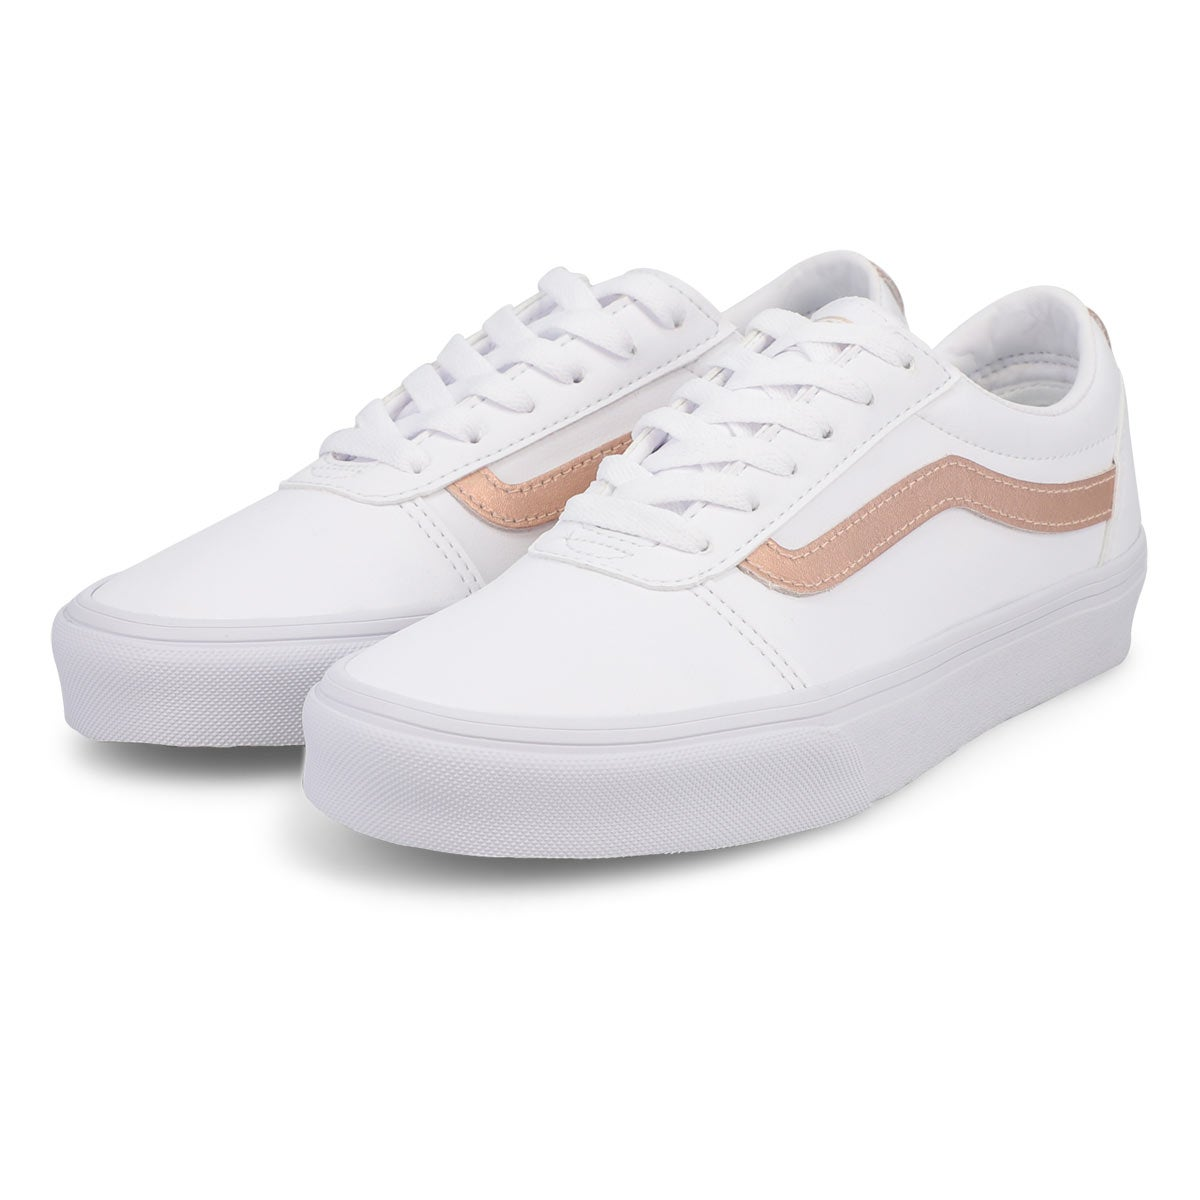 Women's Ward Sneaker - White/Rose Gold